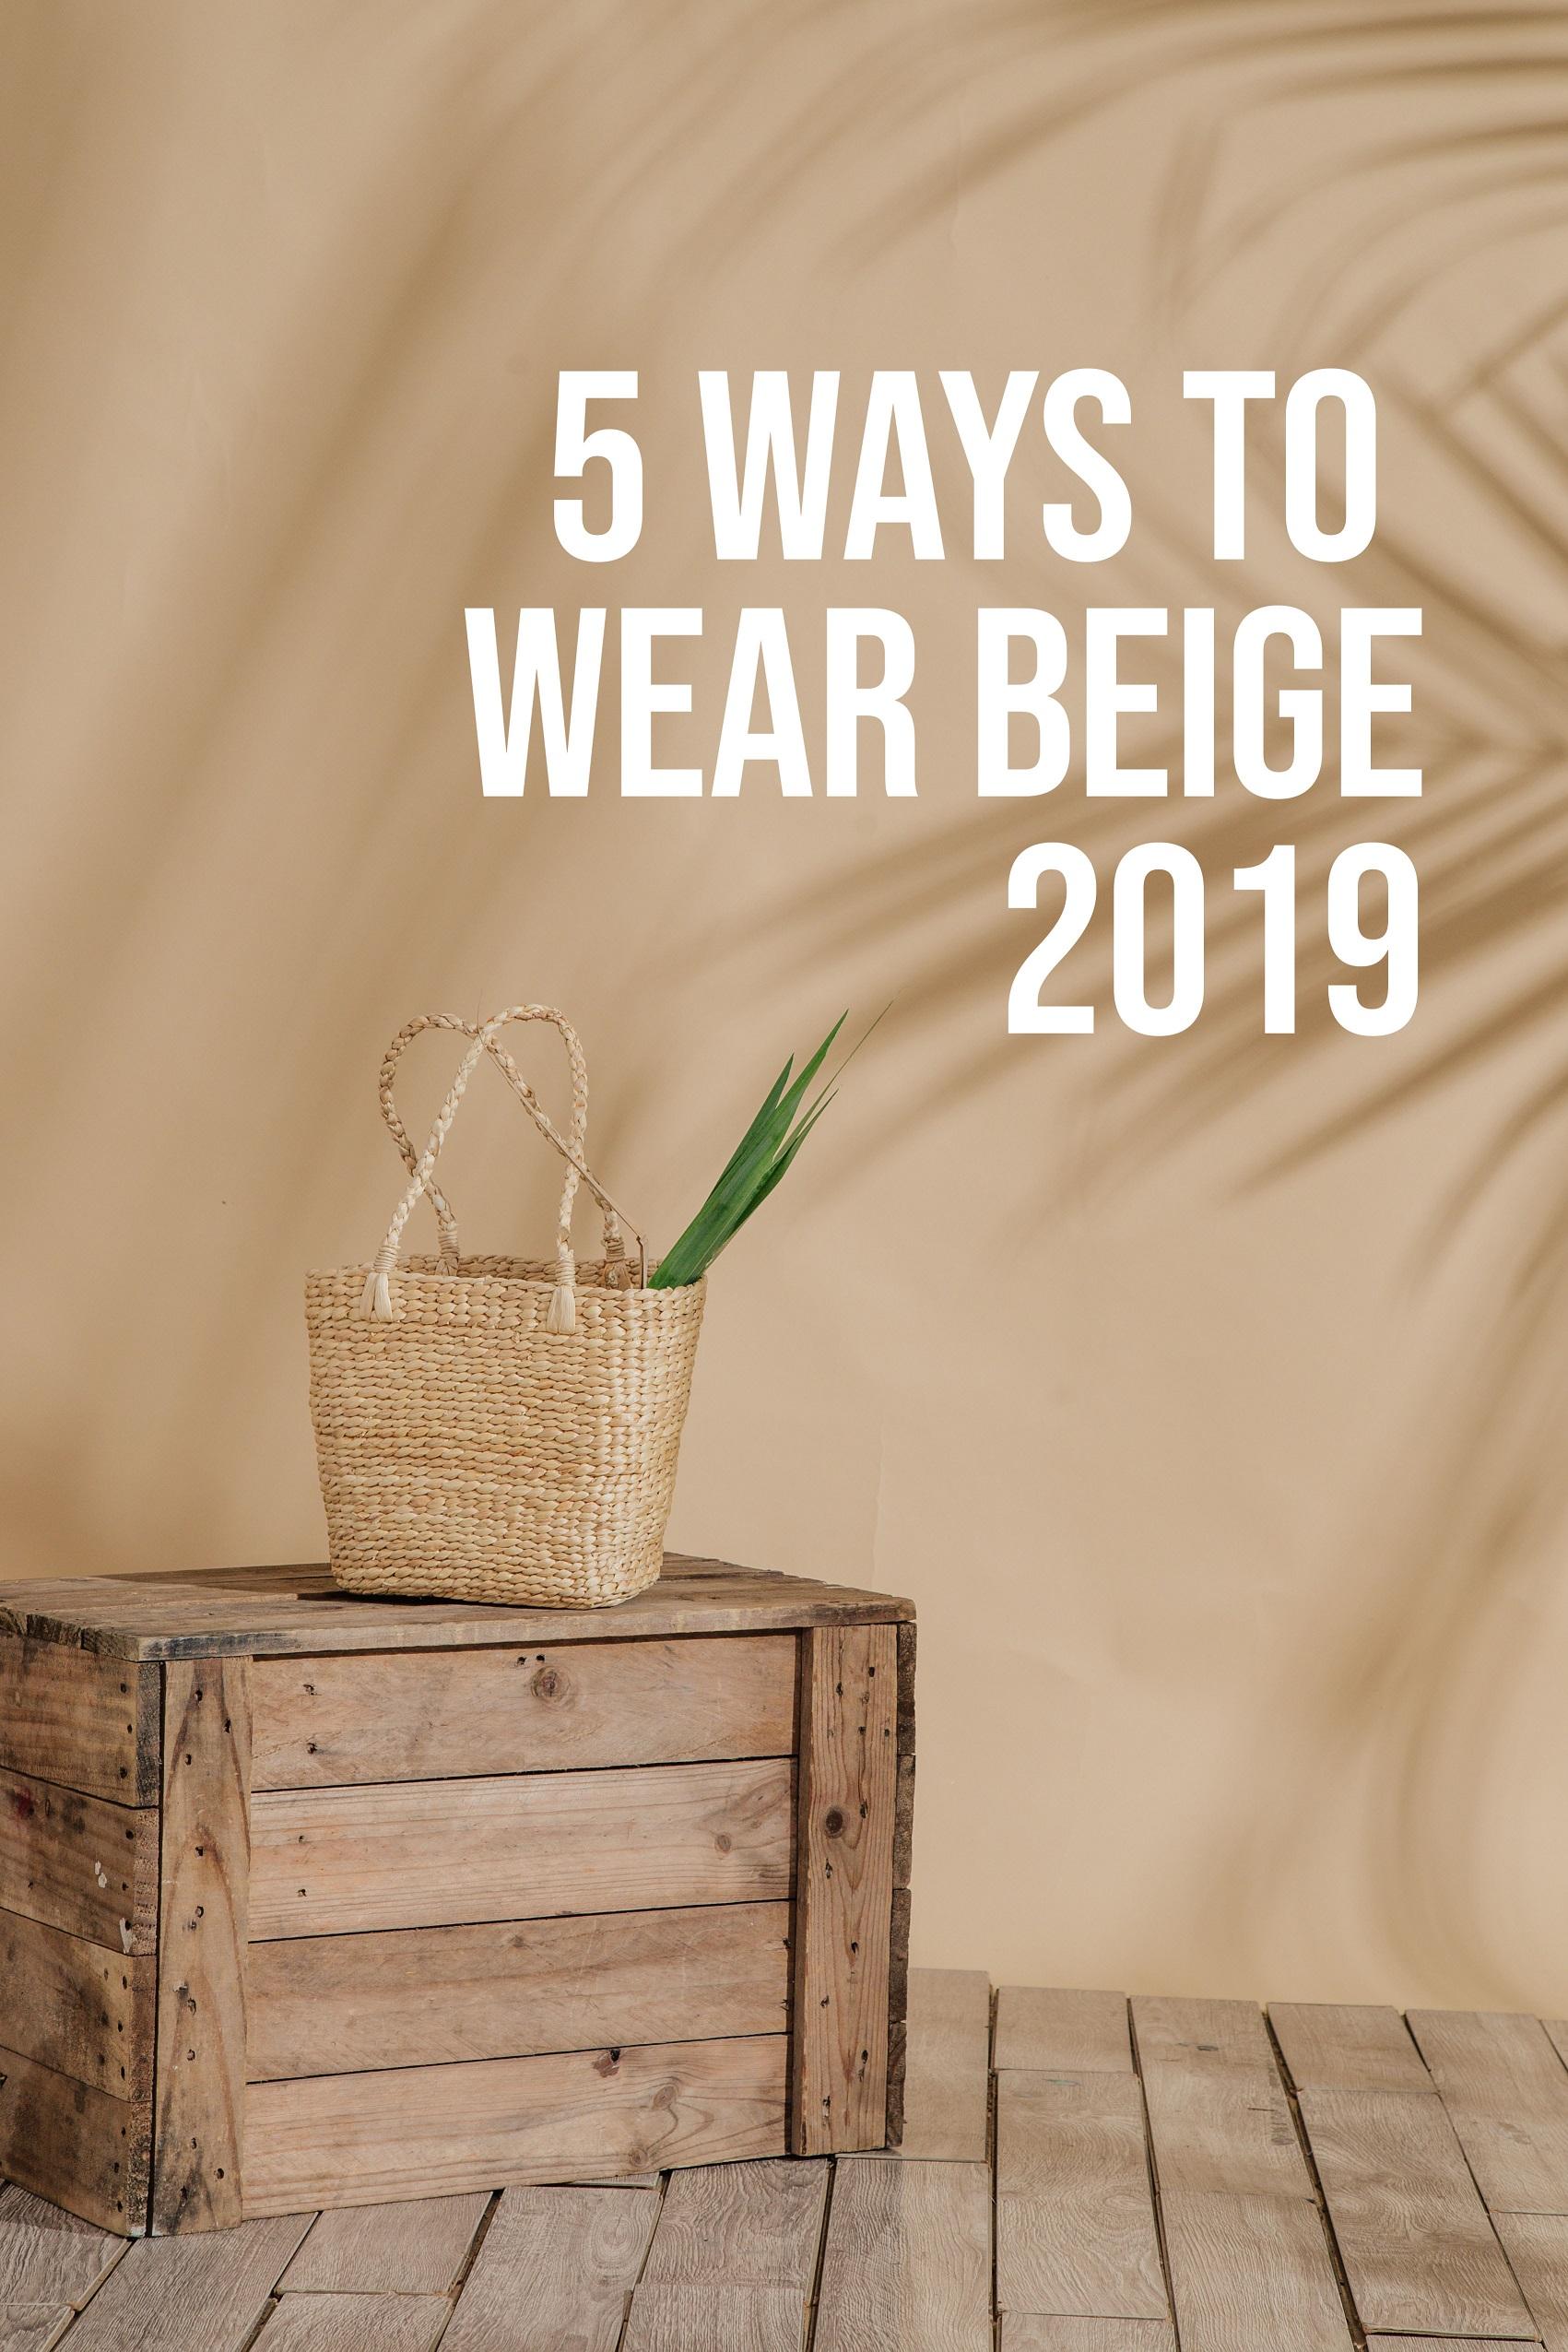 5 Ways To Wear Beige 2019 styling tips beige picture